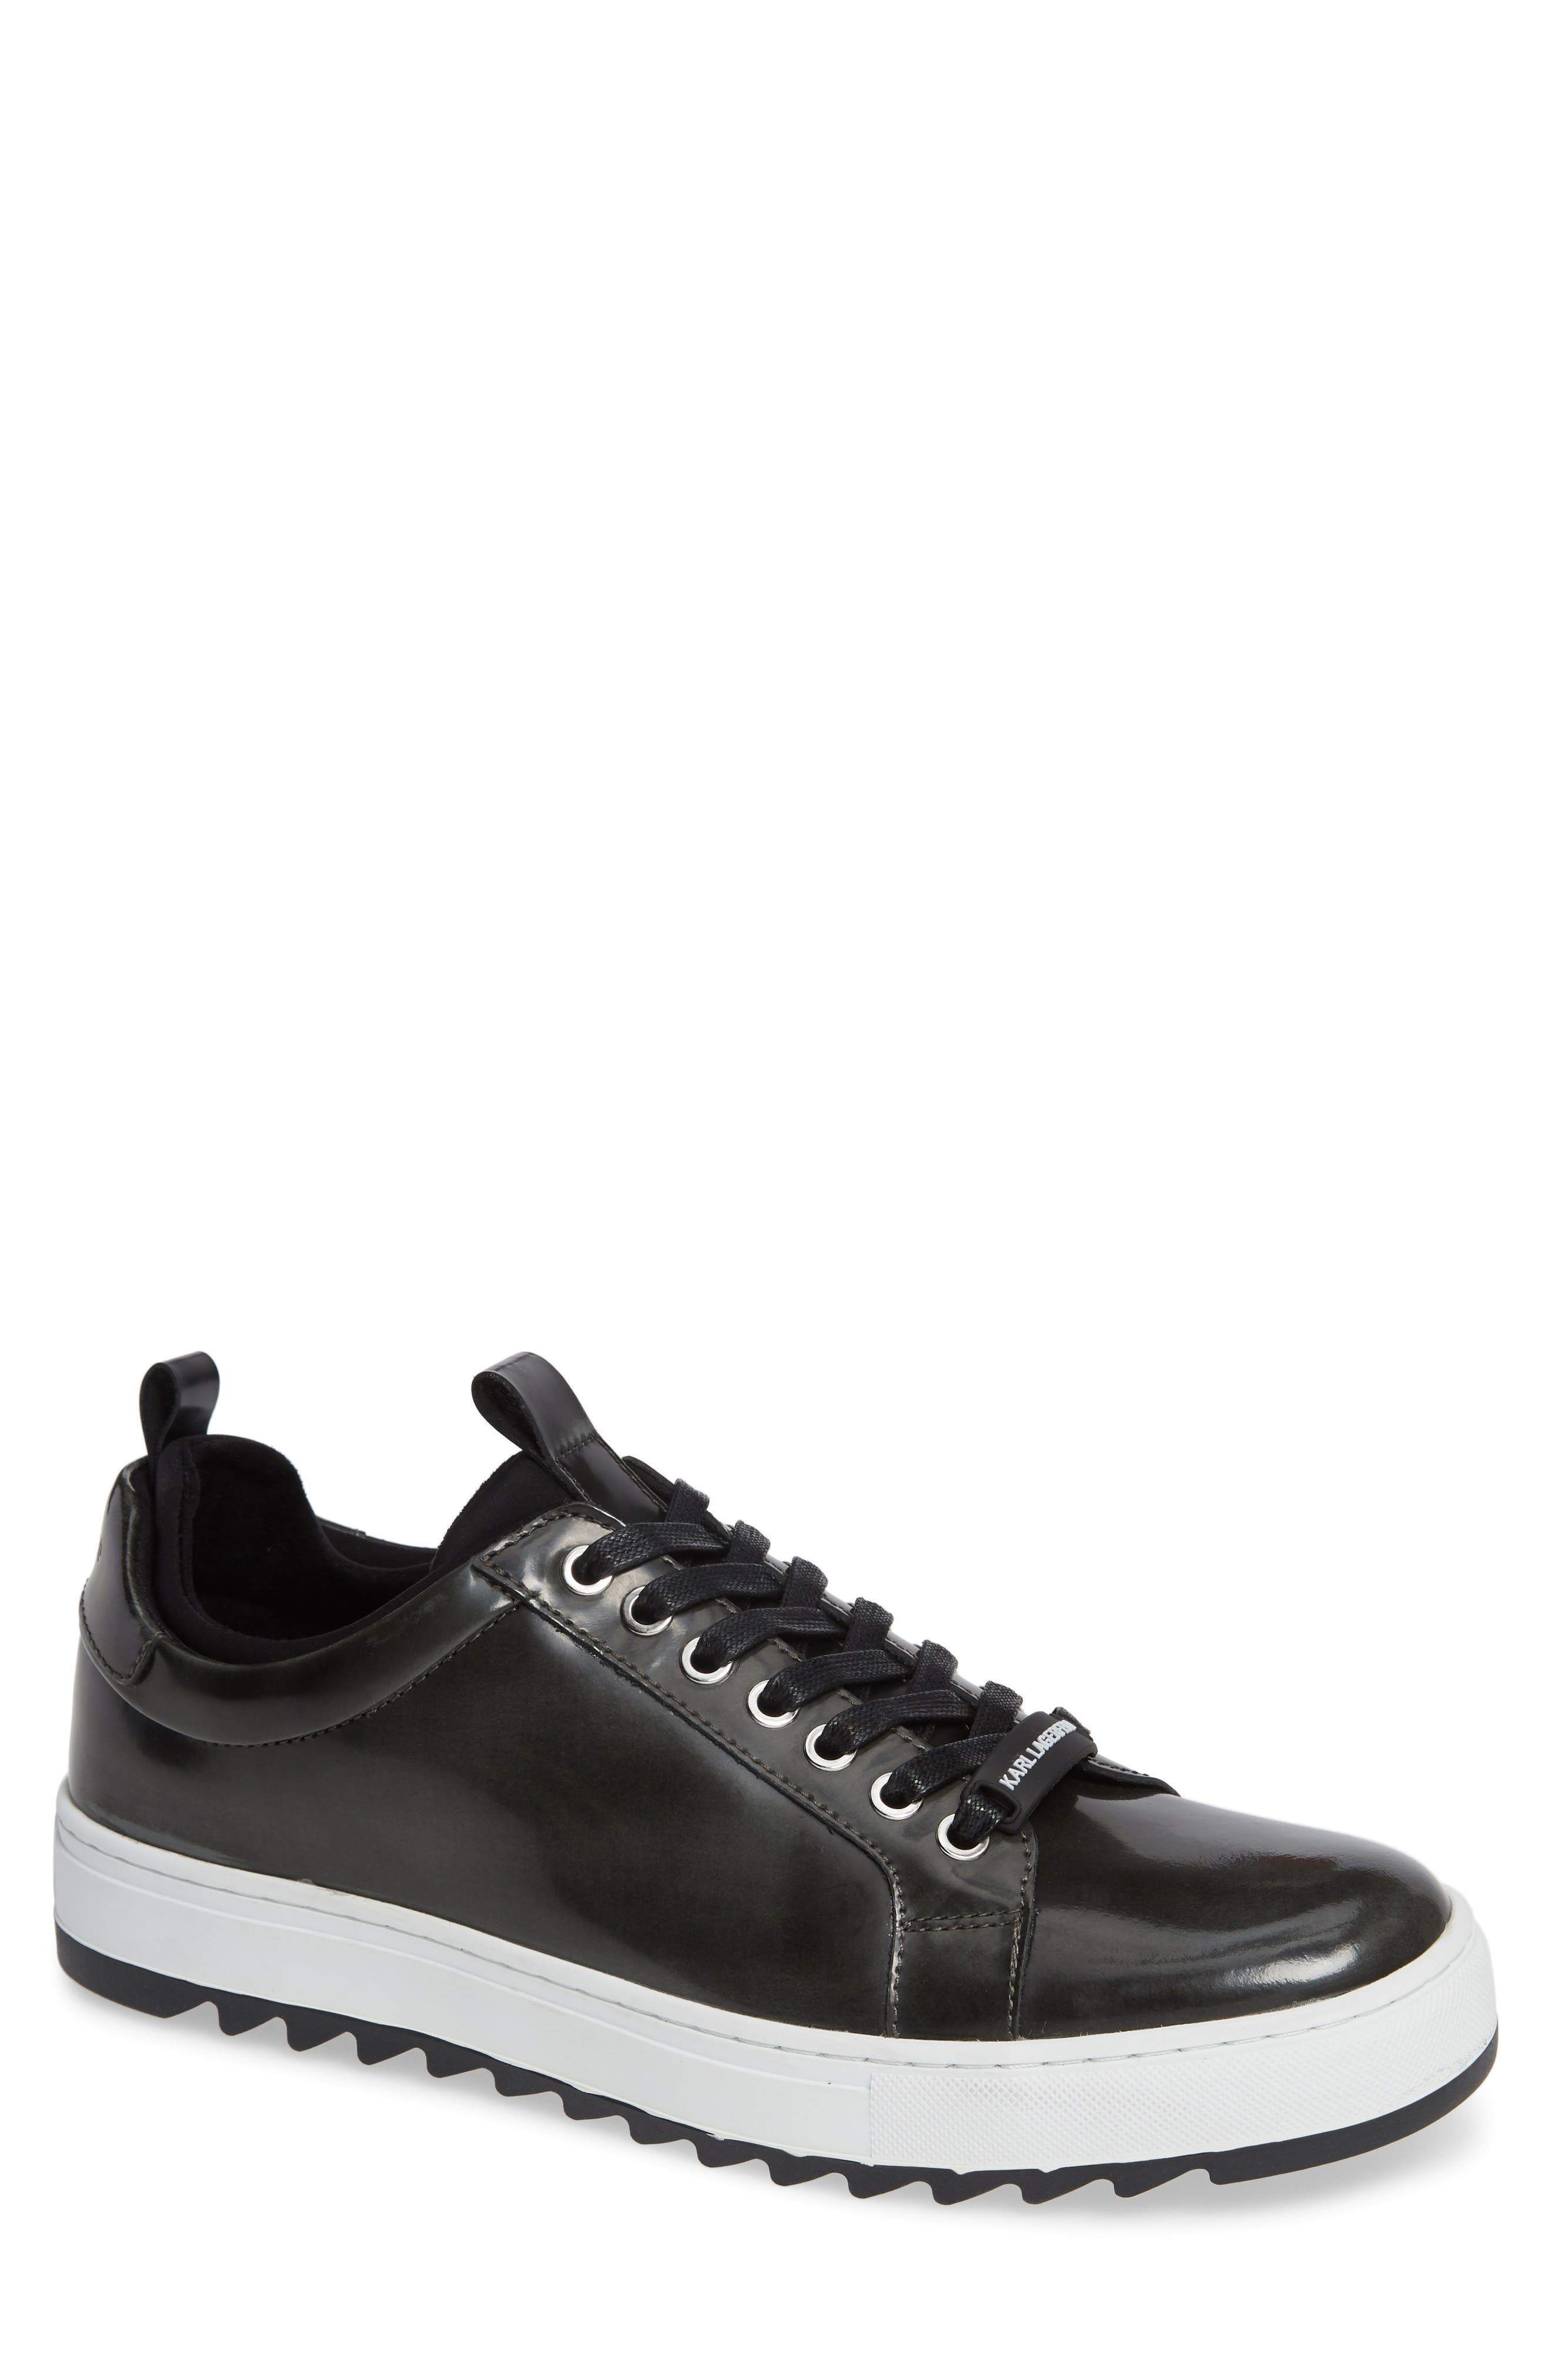 Box Inner Sock Sneaker,                             Main thumbnail 1, color,                             055